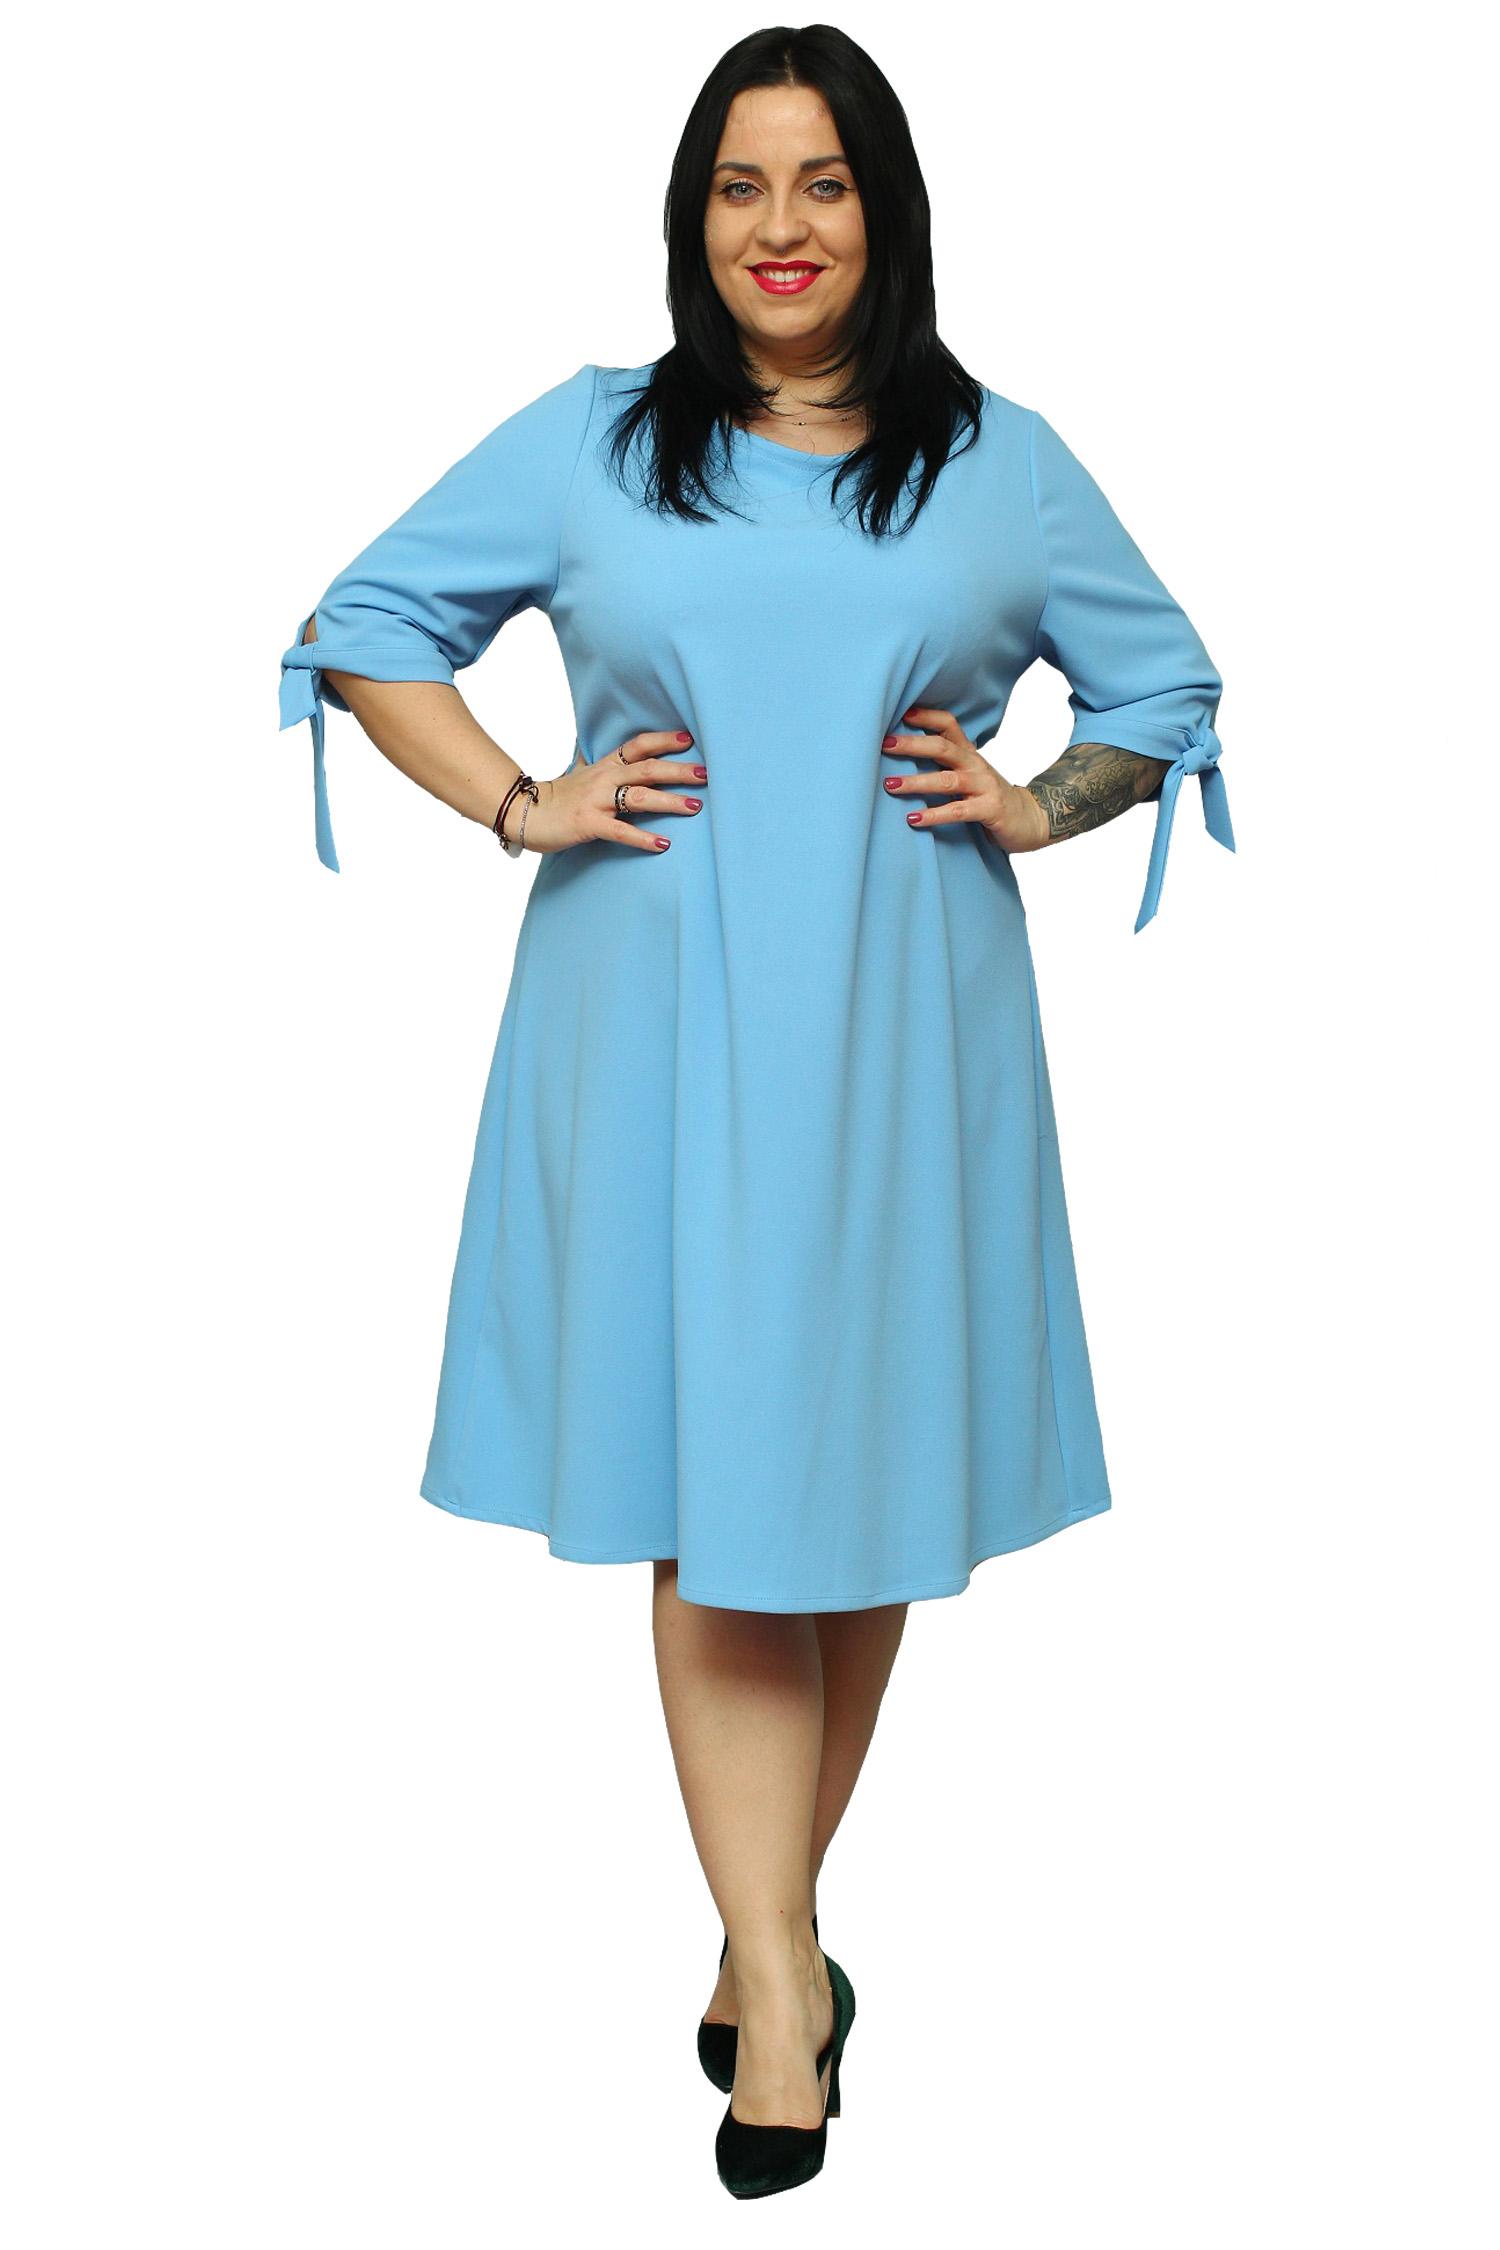 ff457ba176 Sukienka Majka traapezowa pasek błękitna 54 - 7220091685 - oficjalne ...